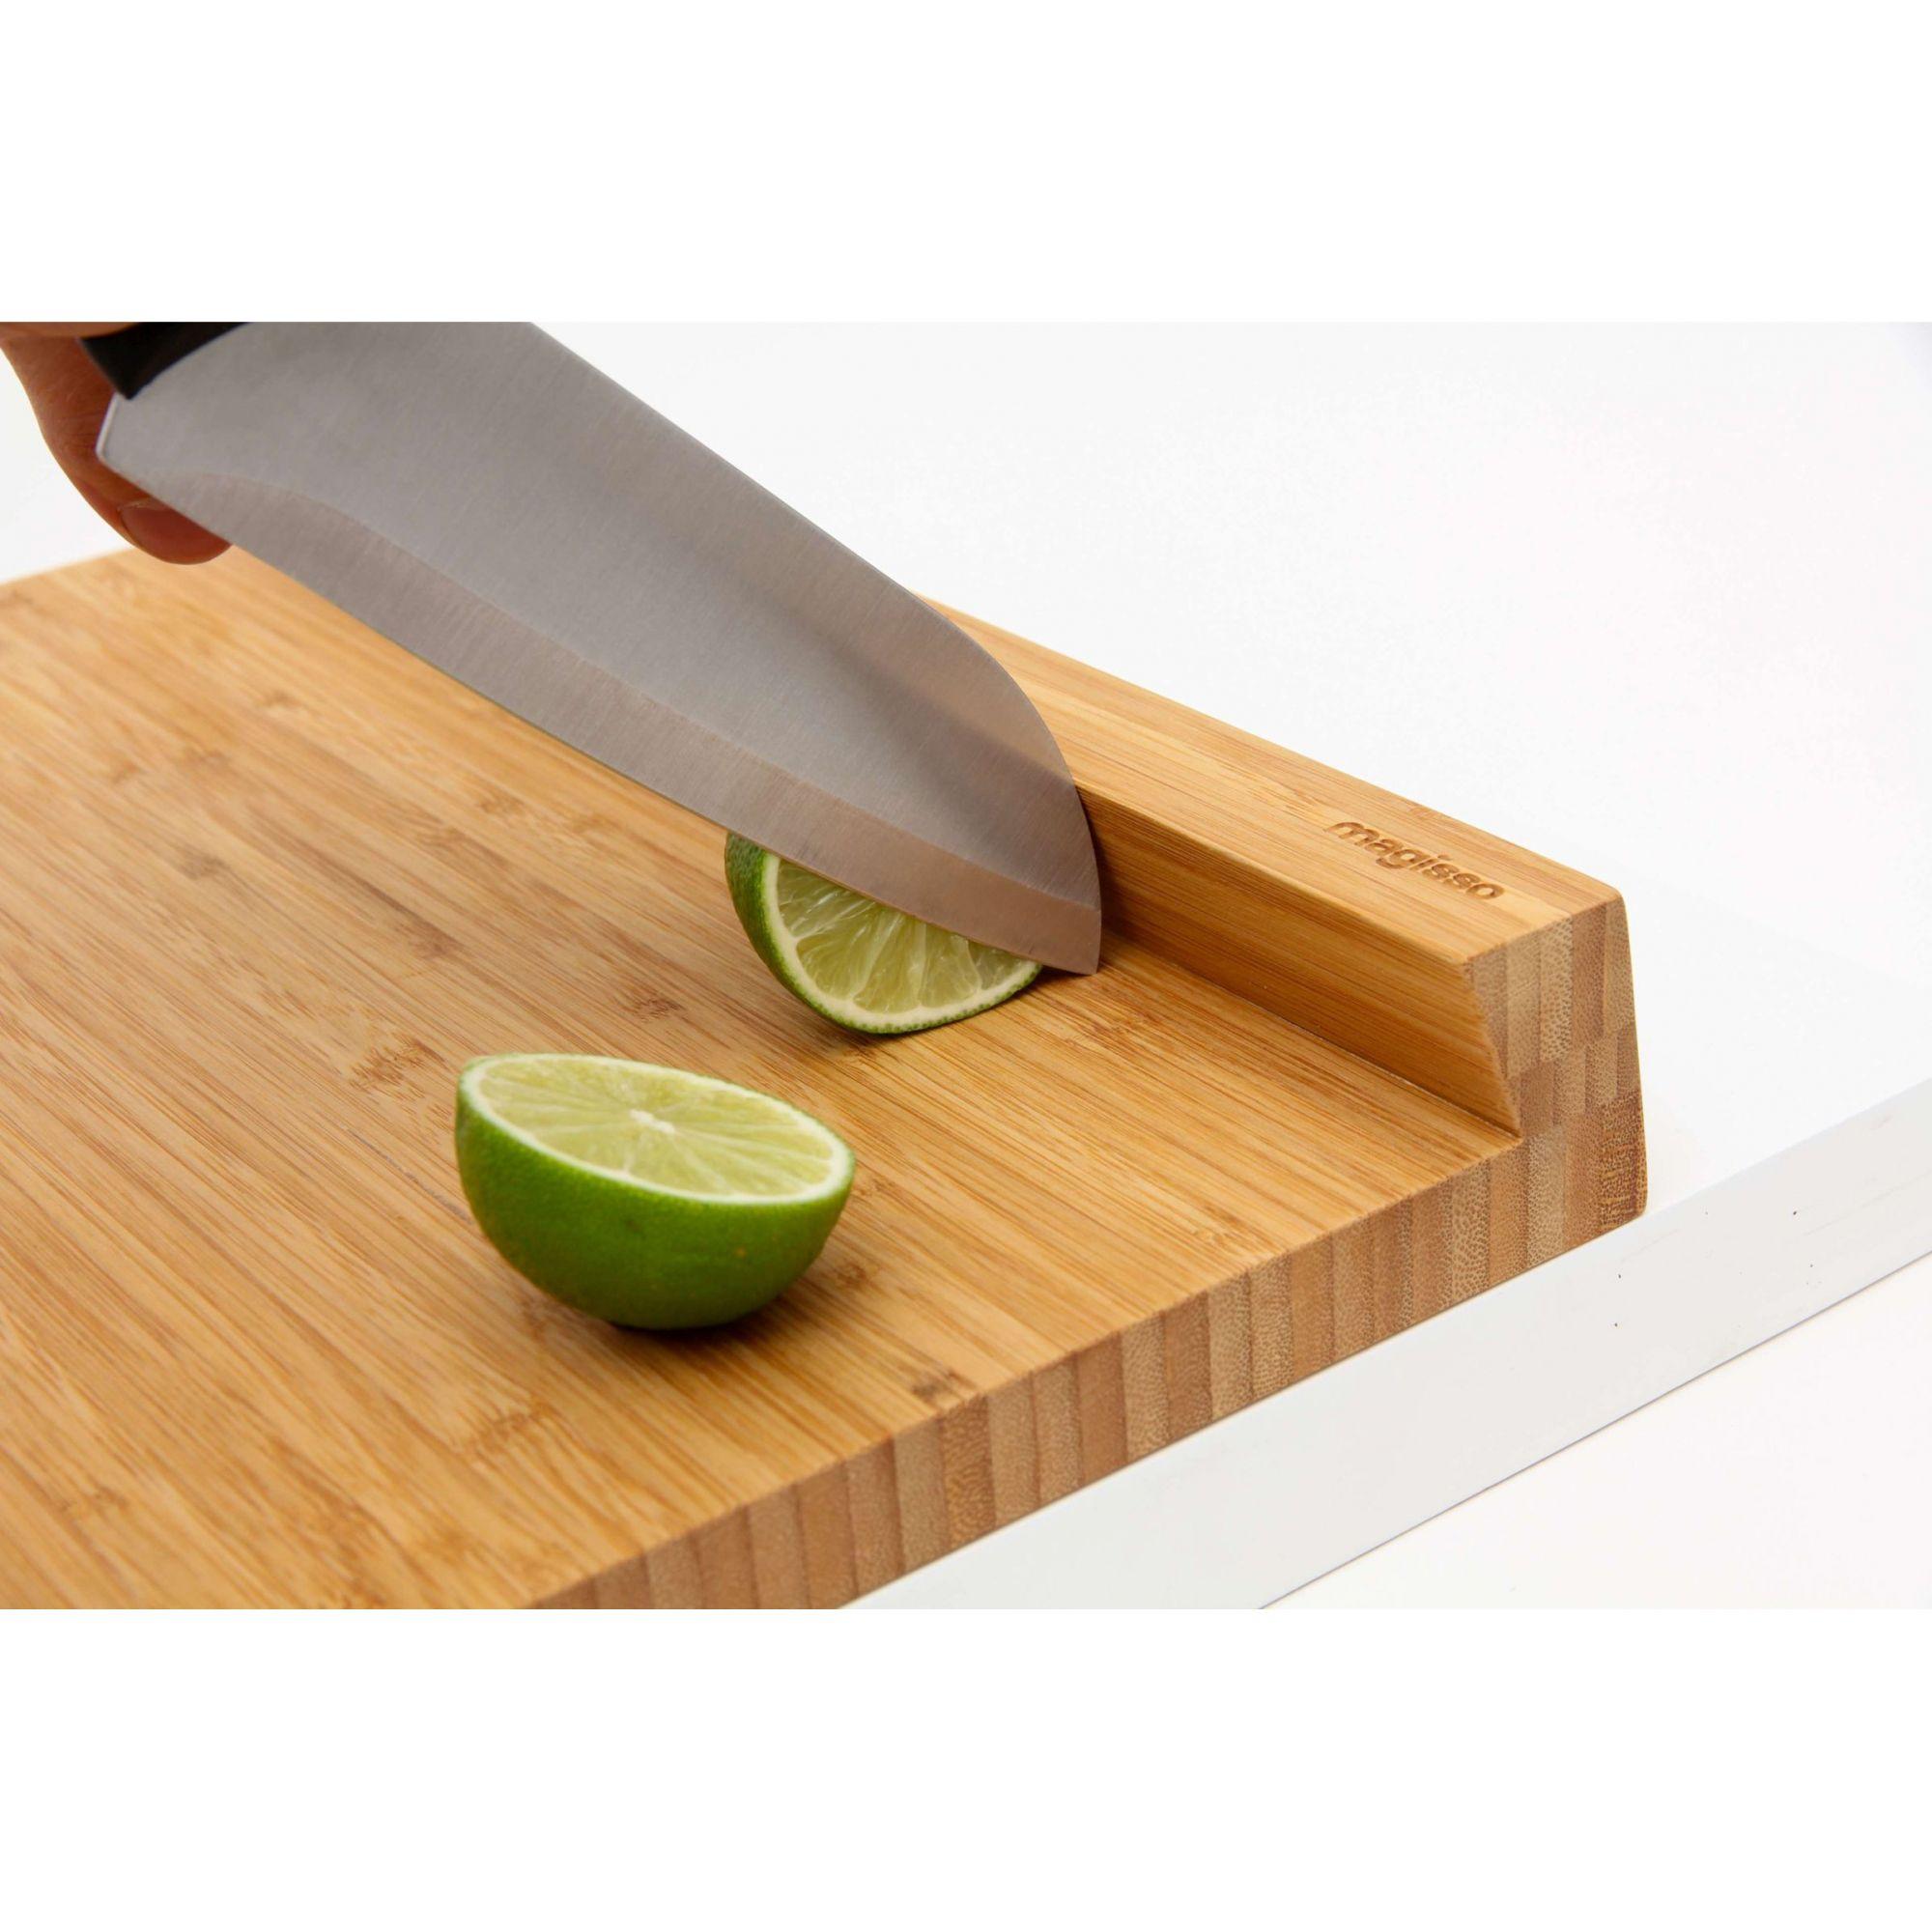 Kit 3x Tábua Magisso em madeira